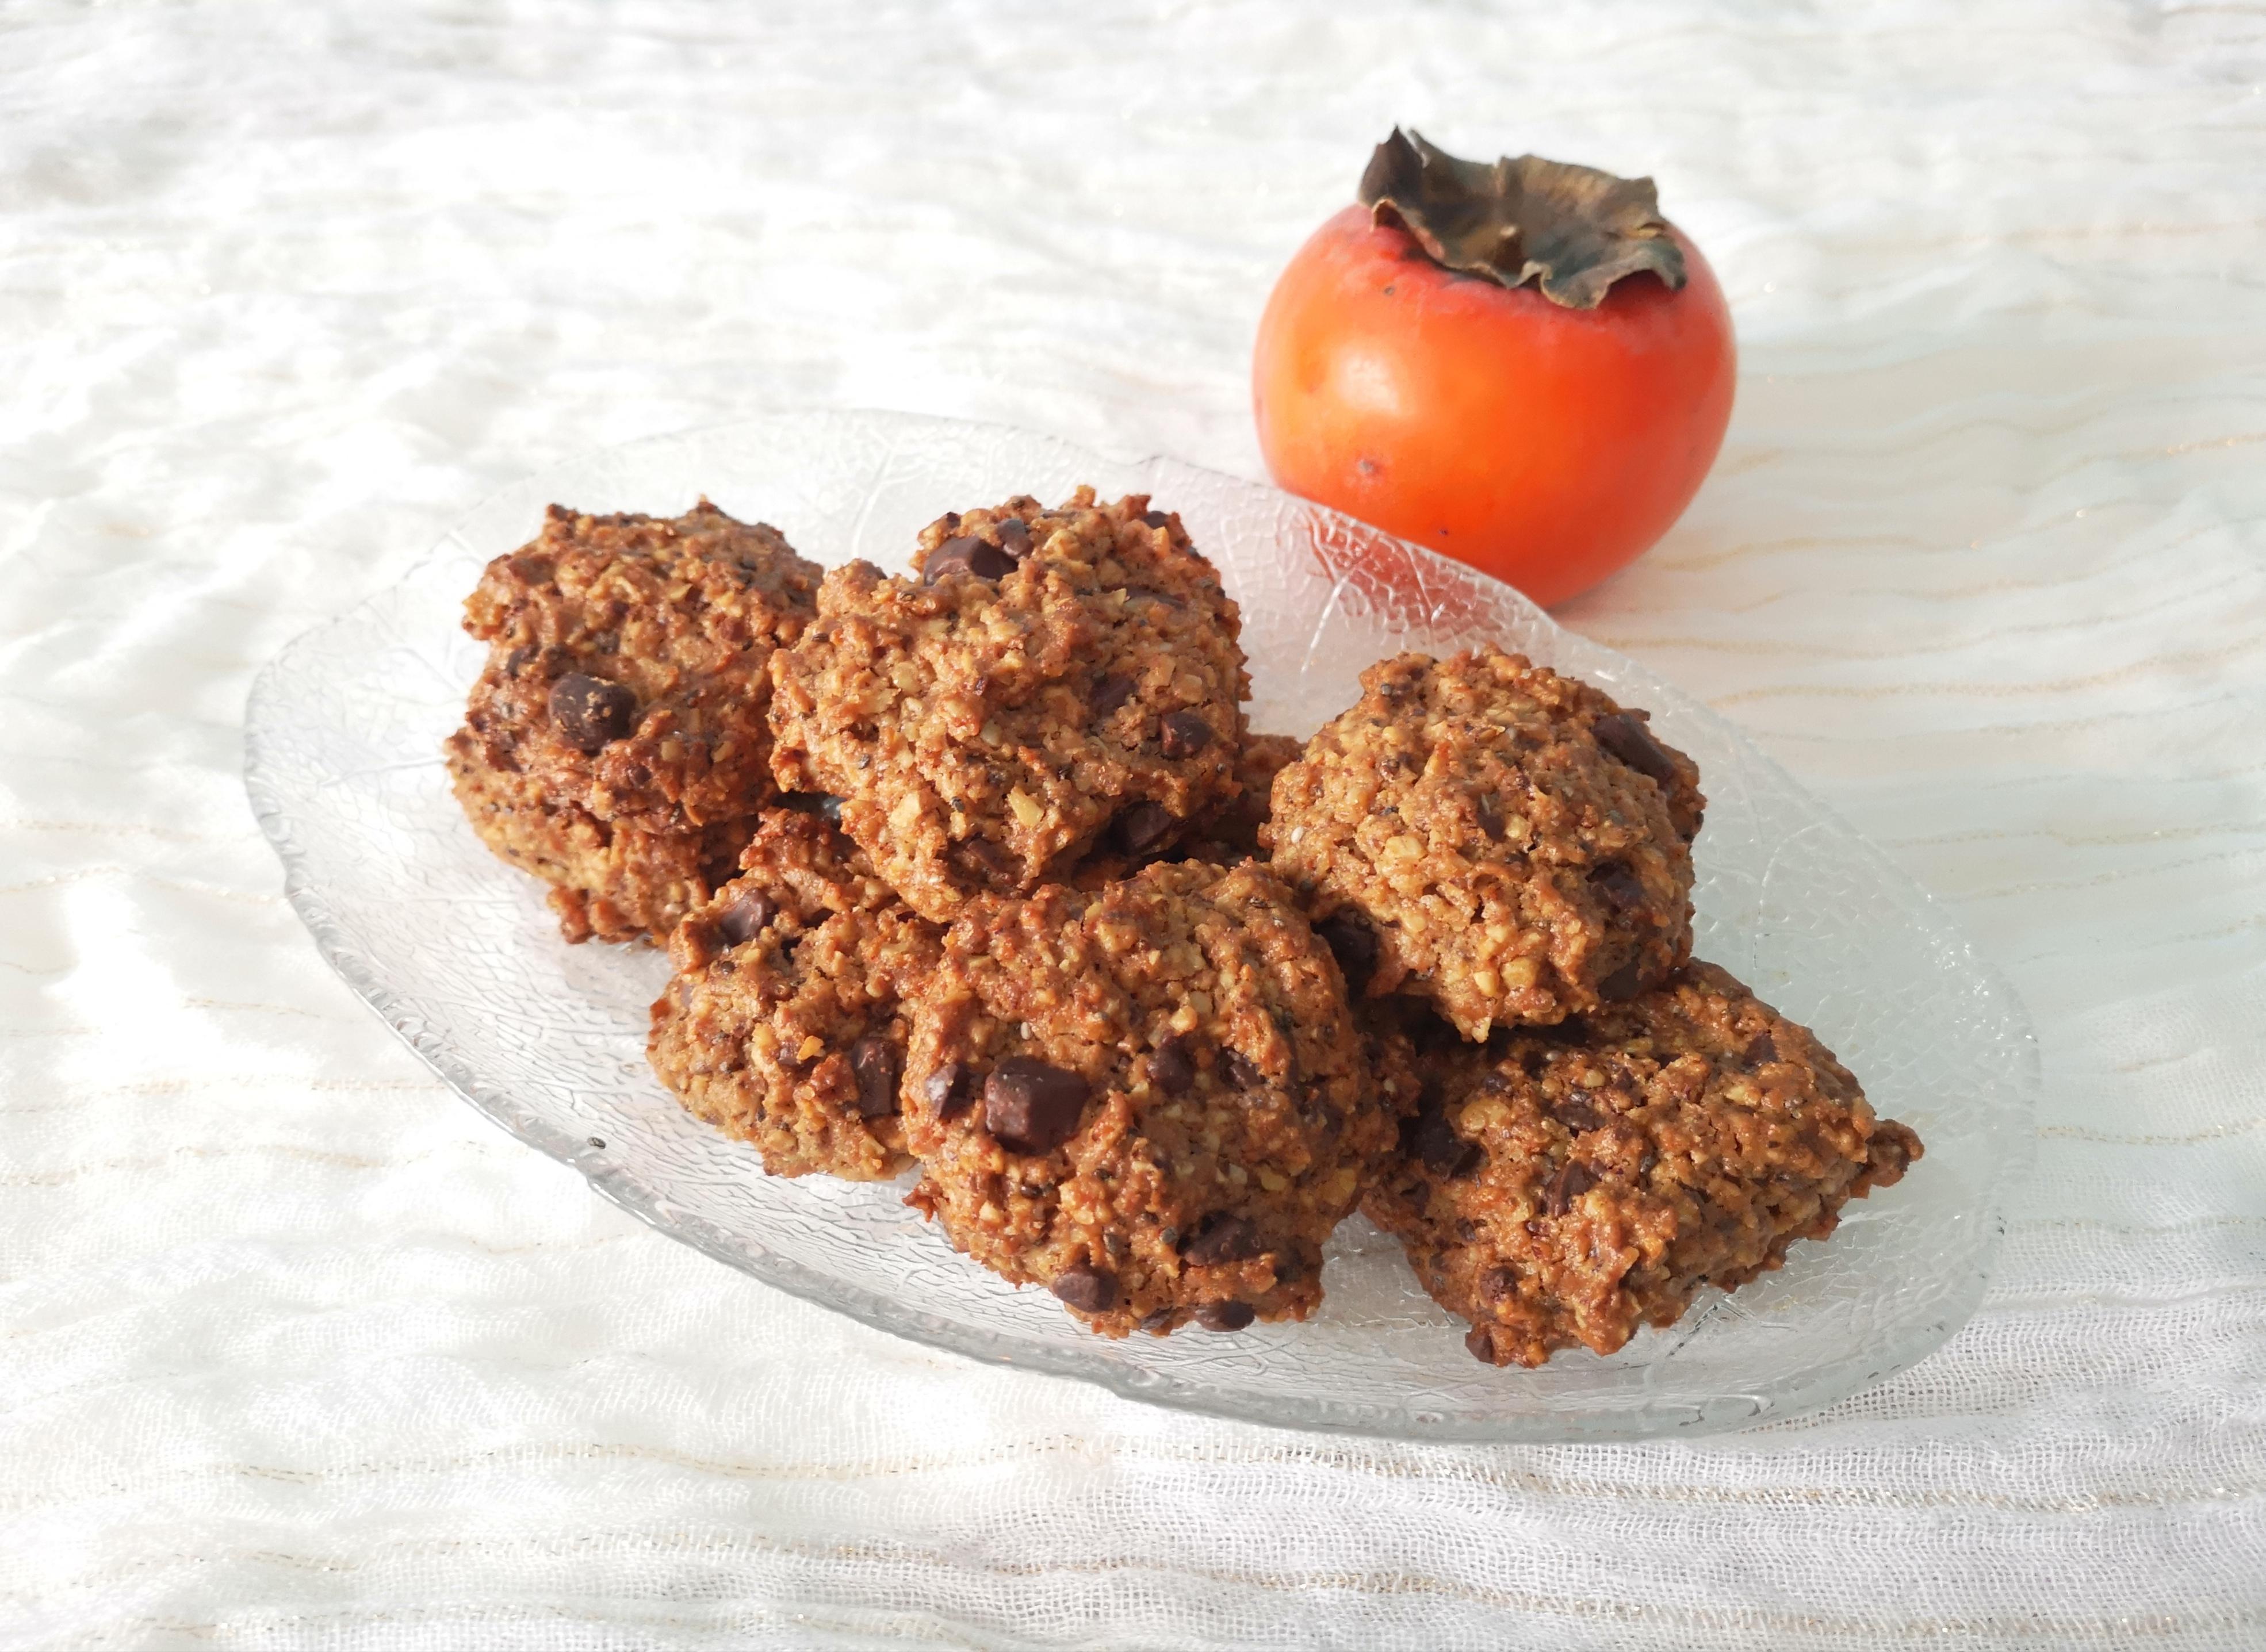 Hazelnut oatmeal cookies with chocolate